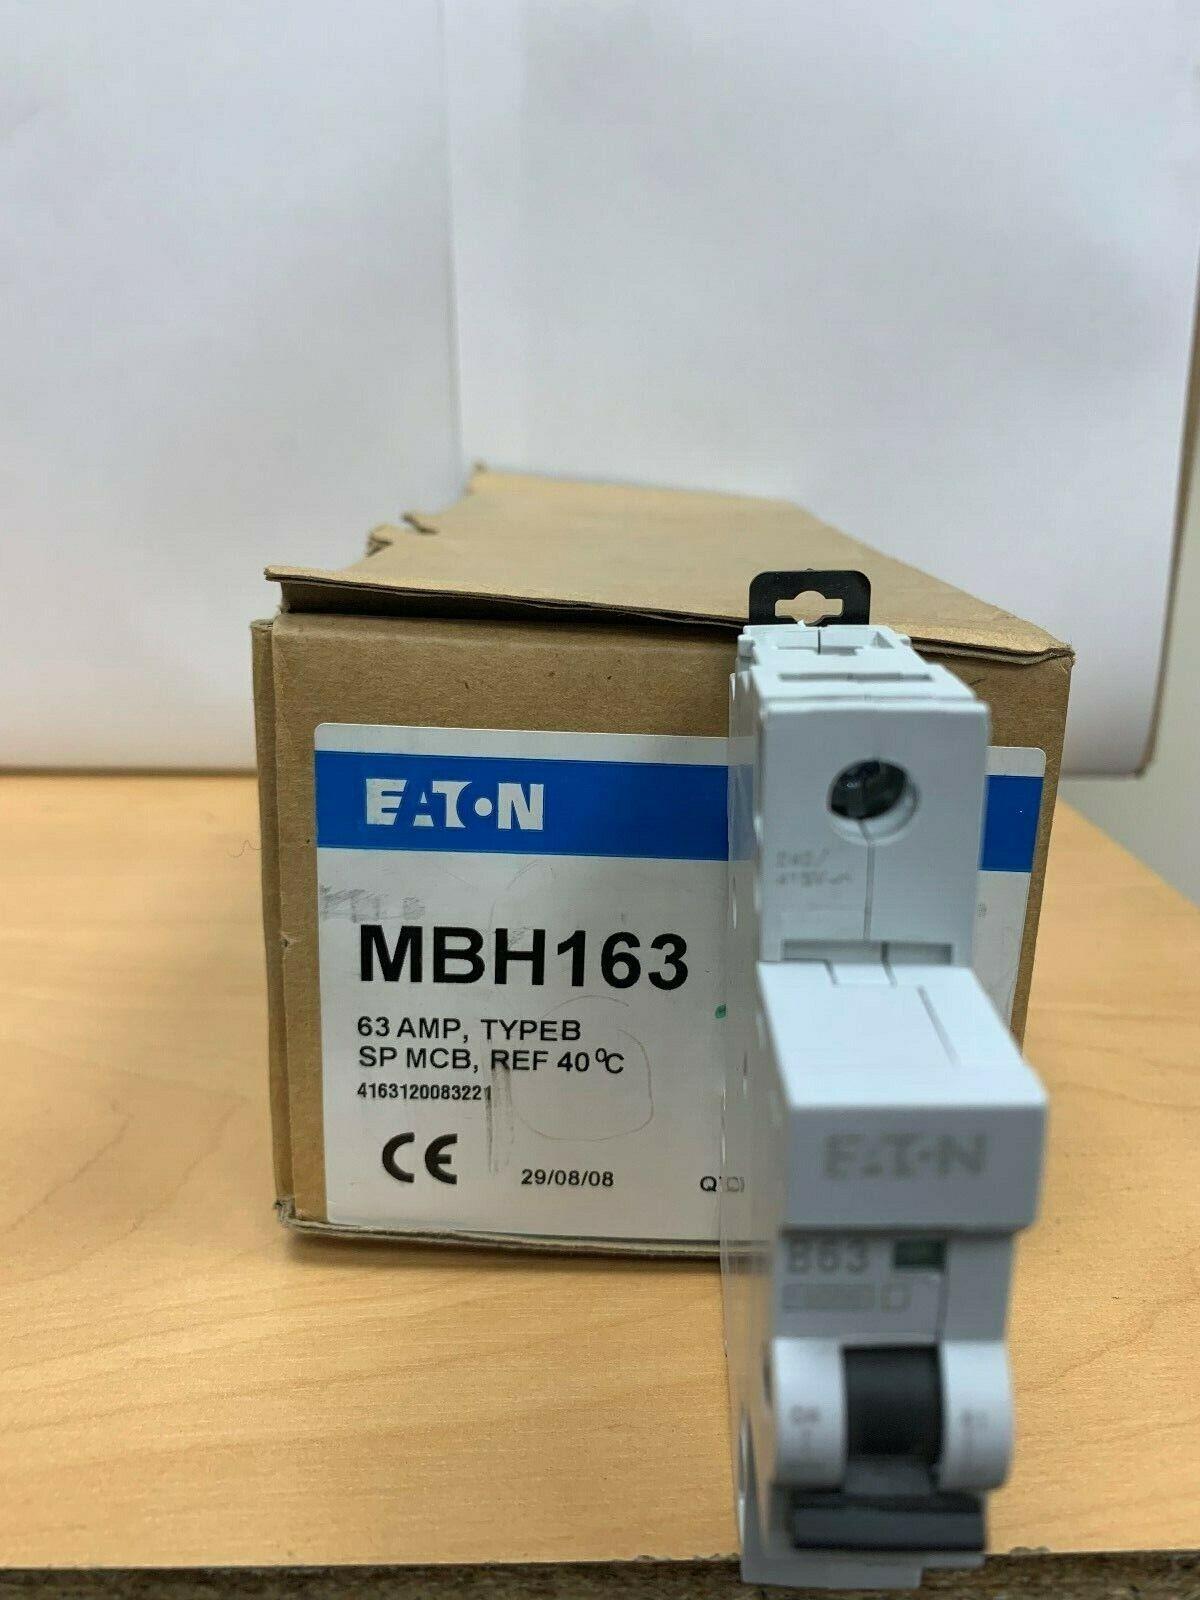 MBH163 EATON MEMSHIELD 2 SP CIRCUIT BREAKER B63 63A